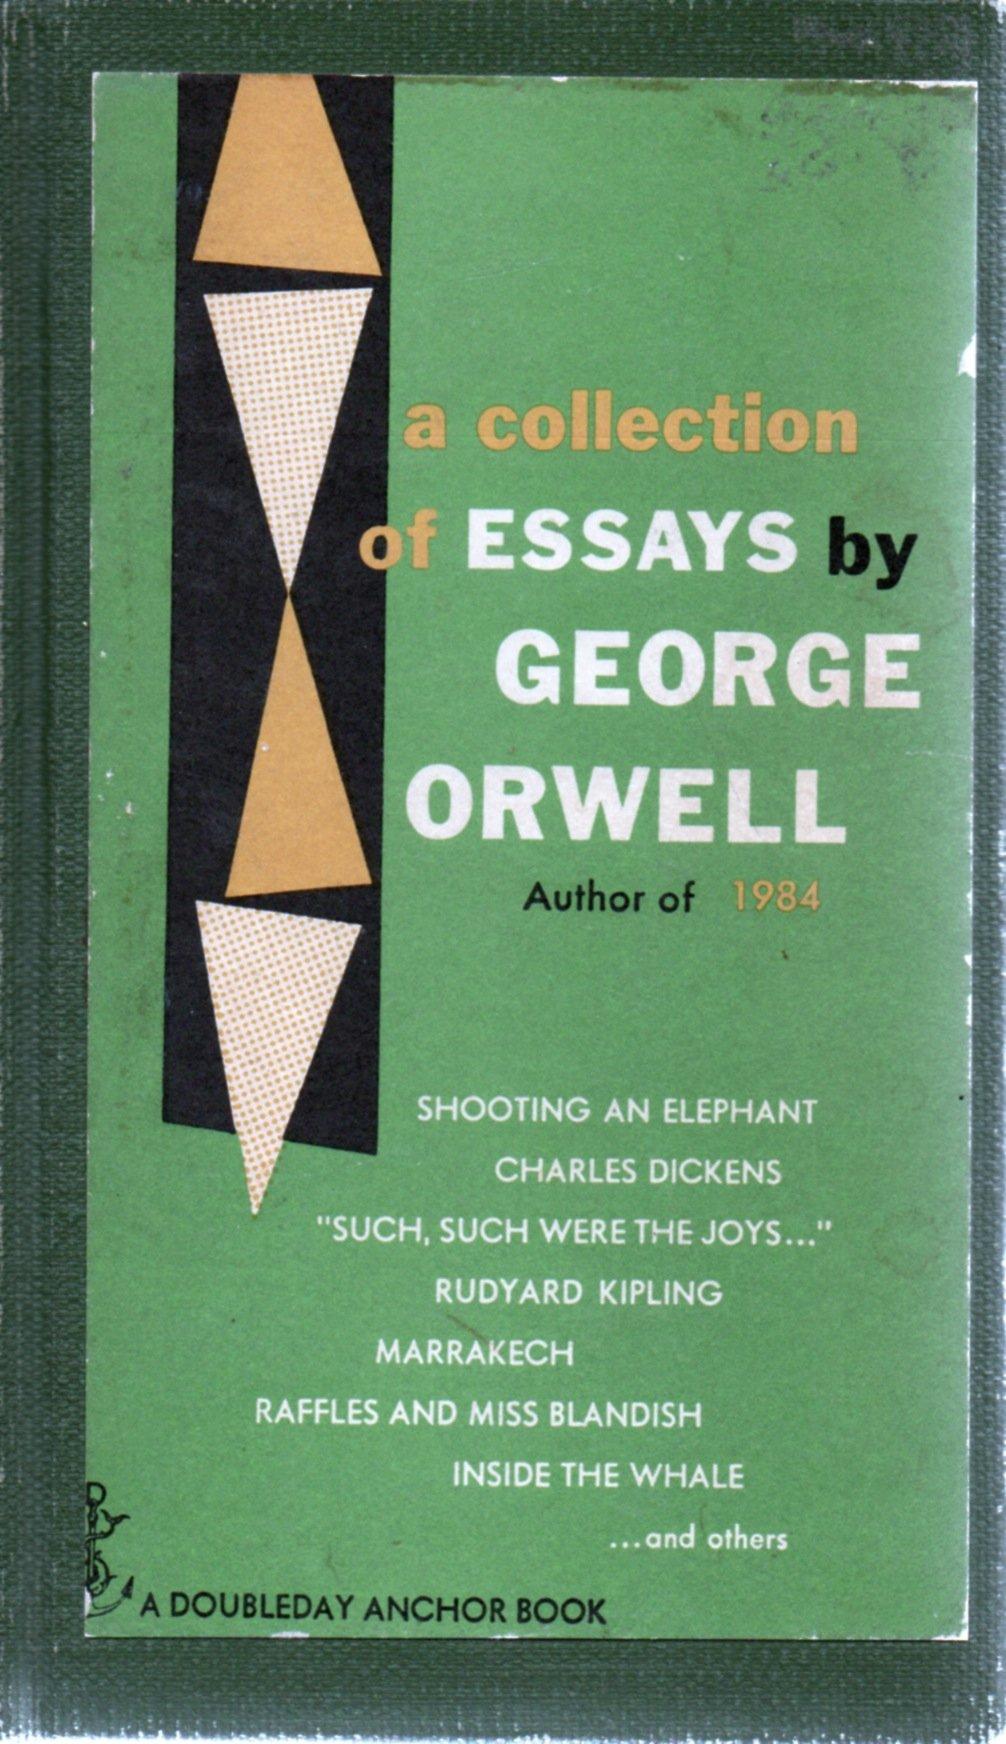 009 George Orwell Essays Essay Example Frightening Everyman's Library Summary Bookshop Memories Full